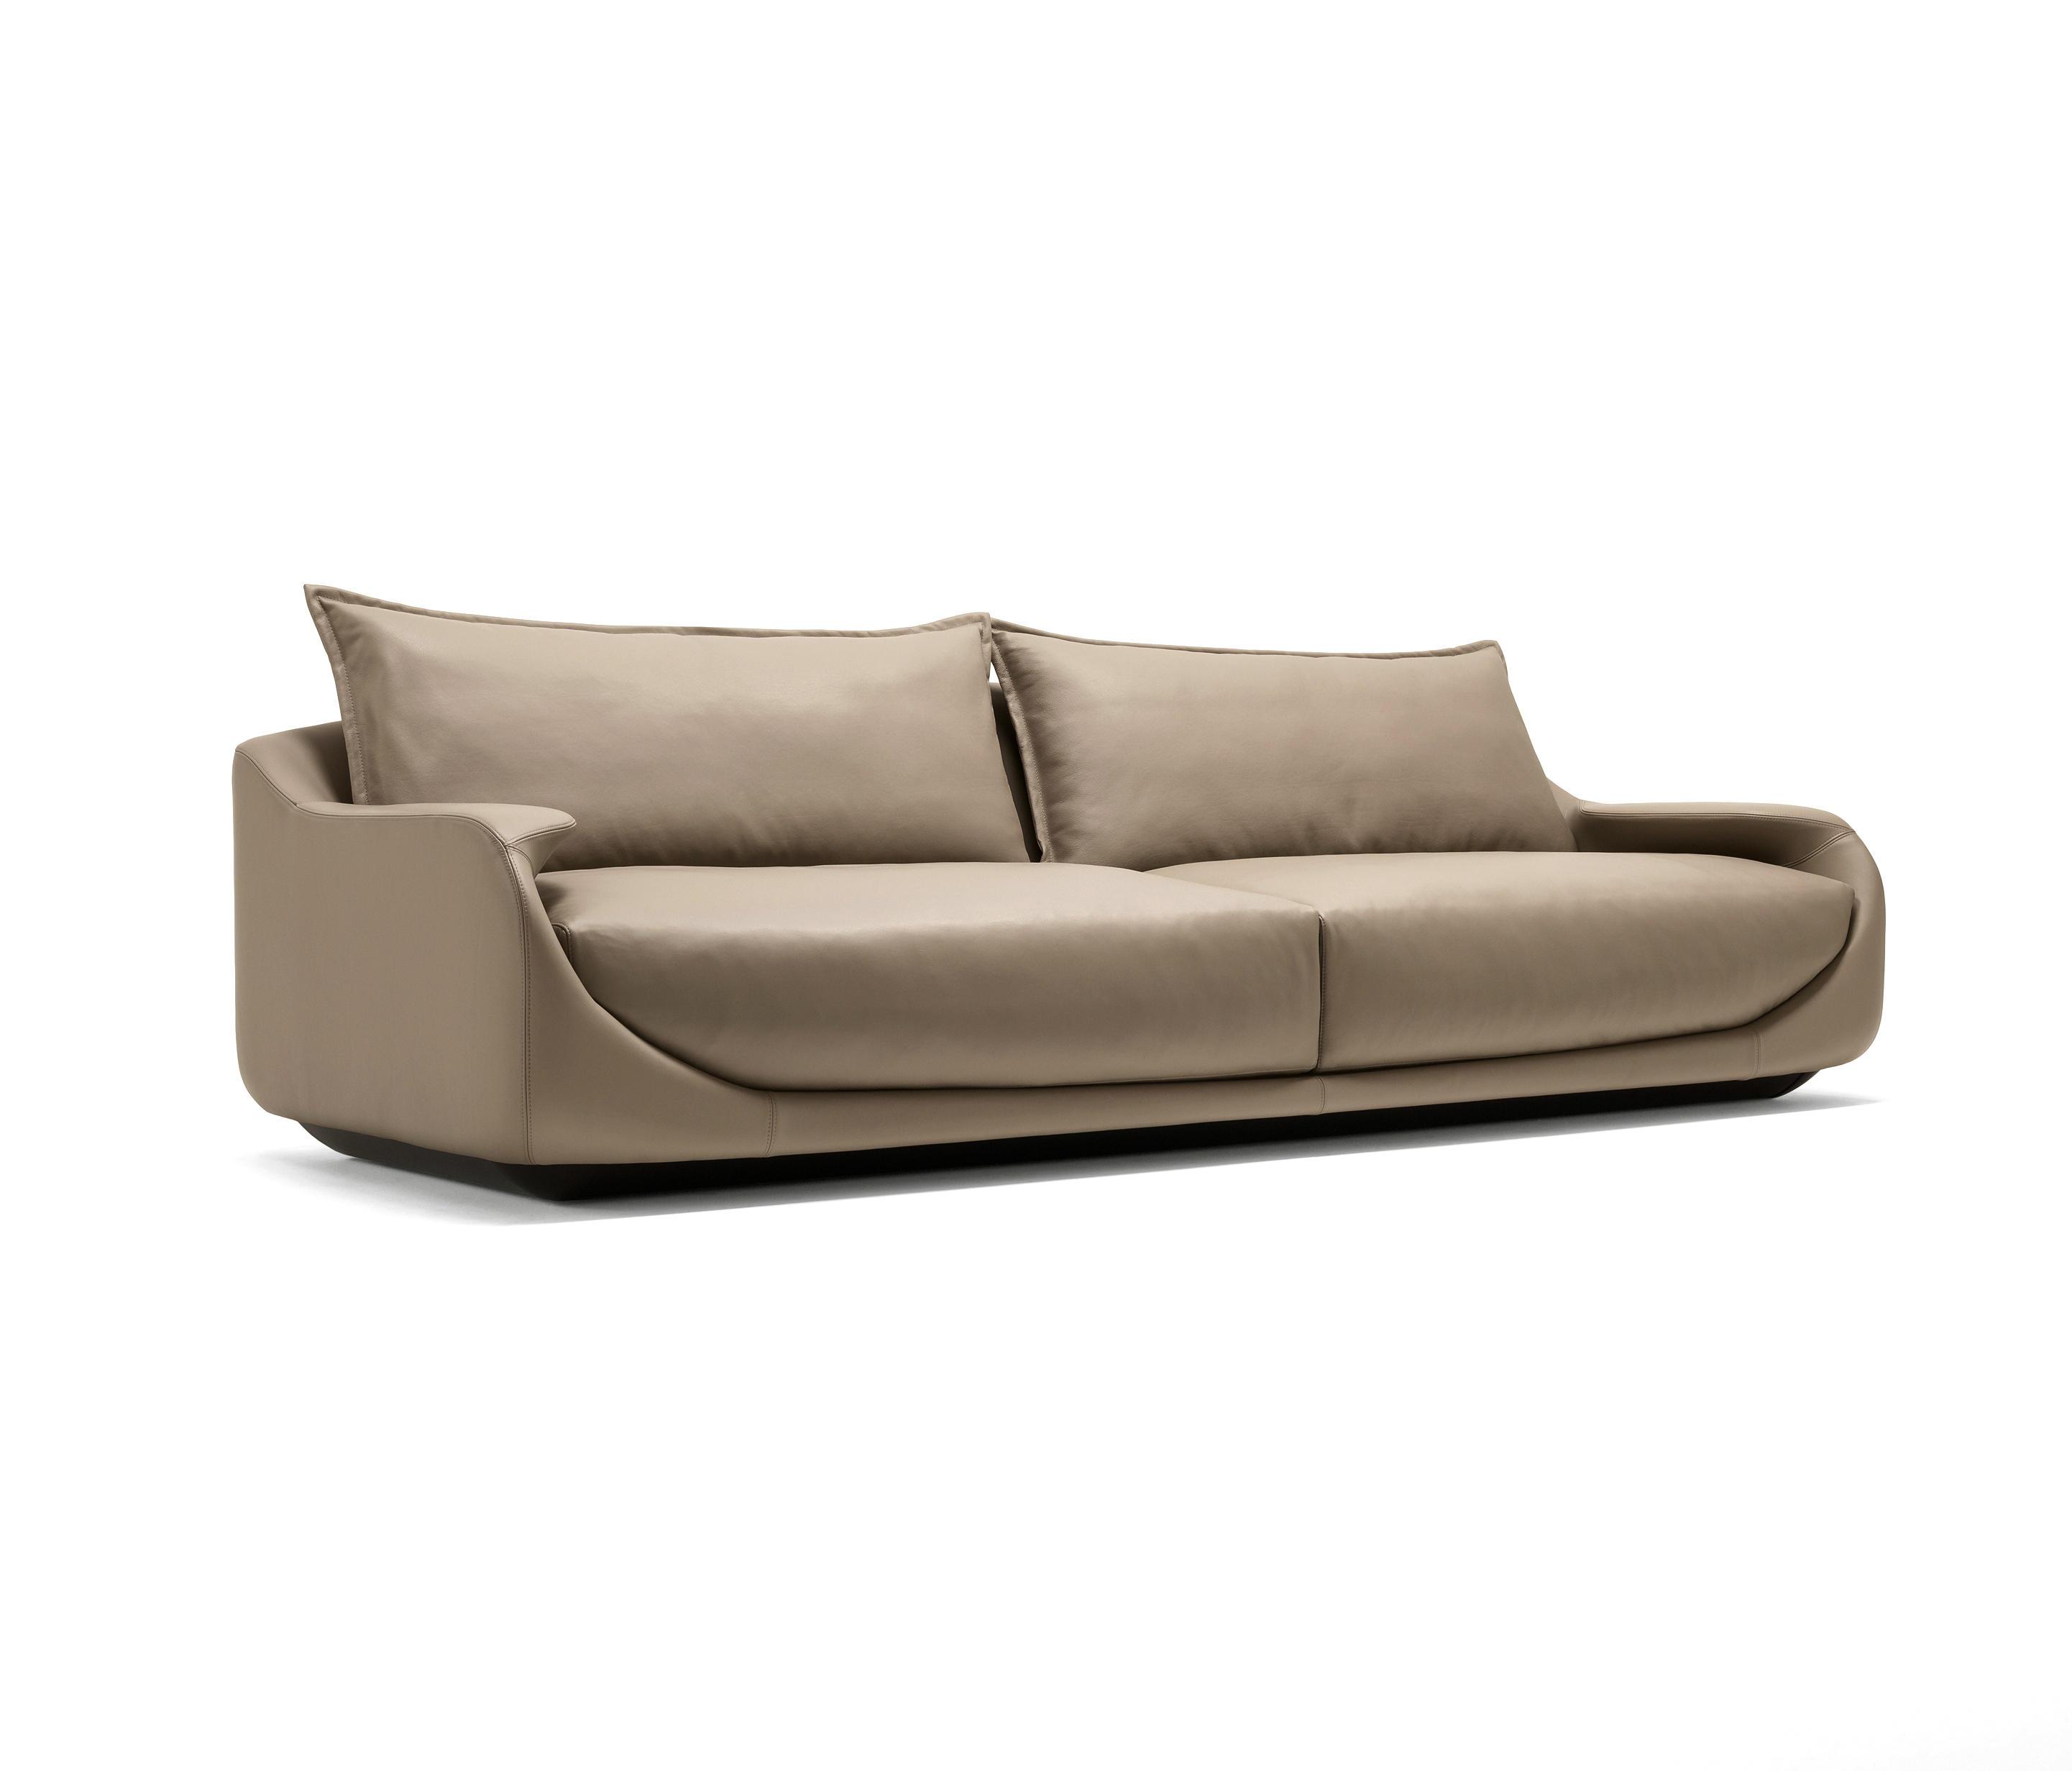 Martini Two Seat Sofa By Giorgetti Sofas